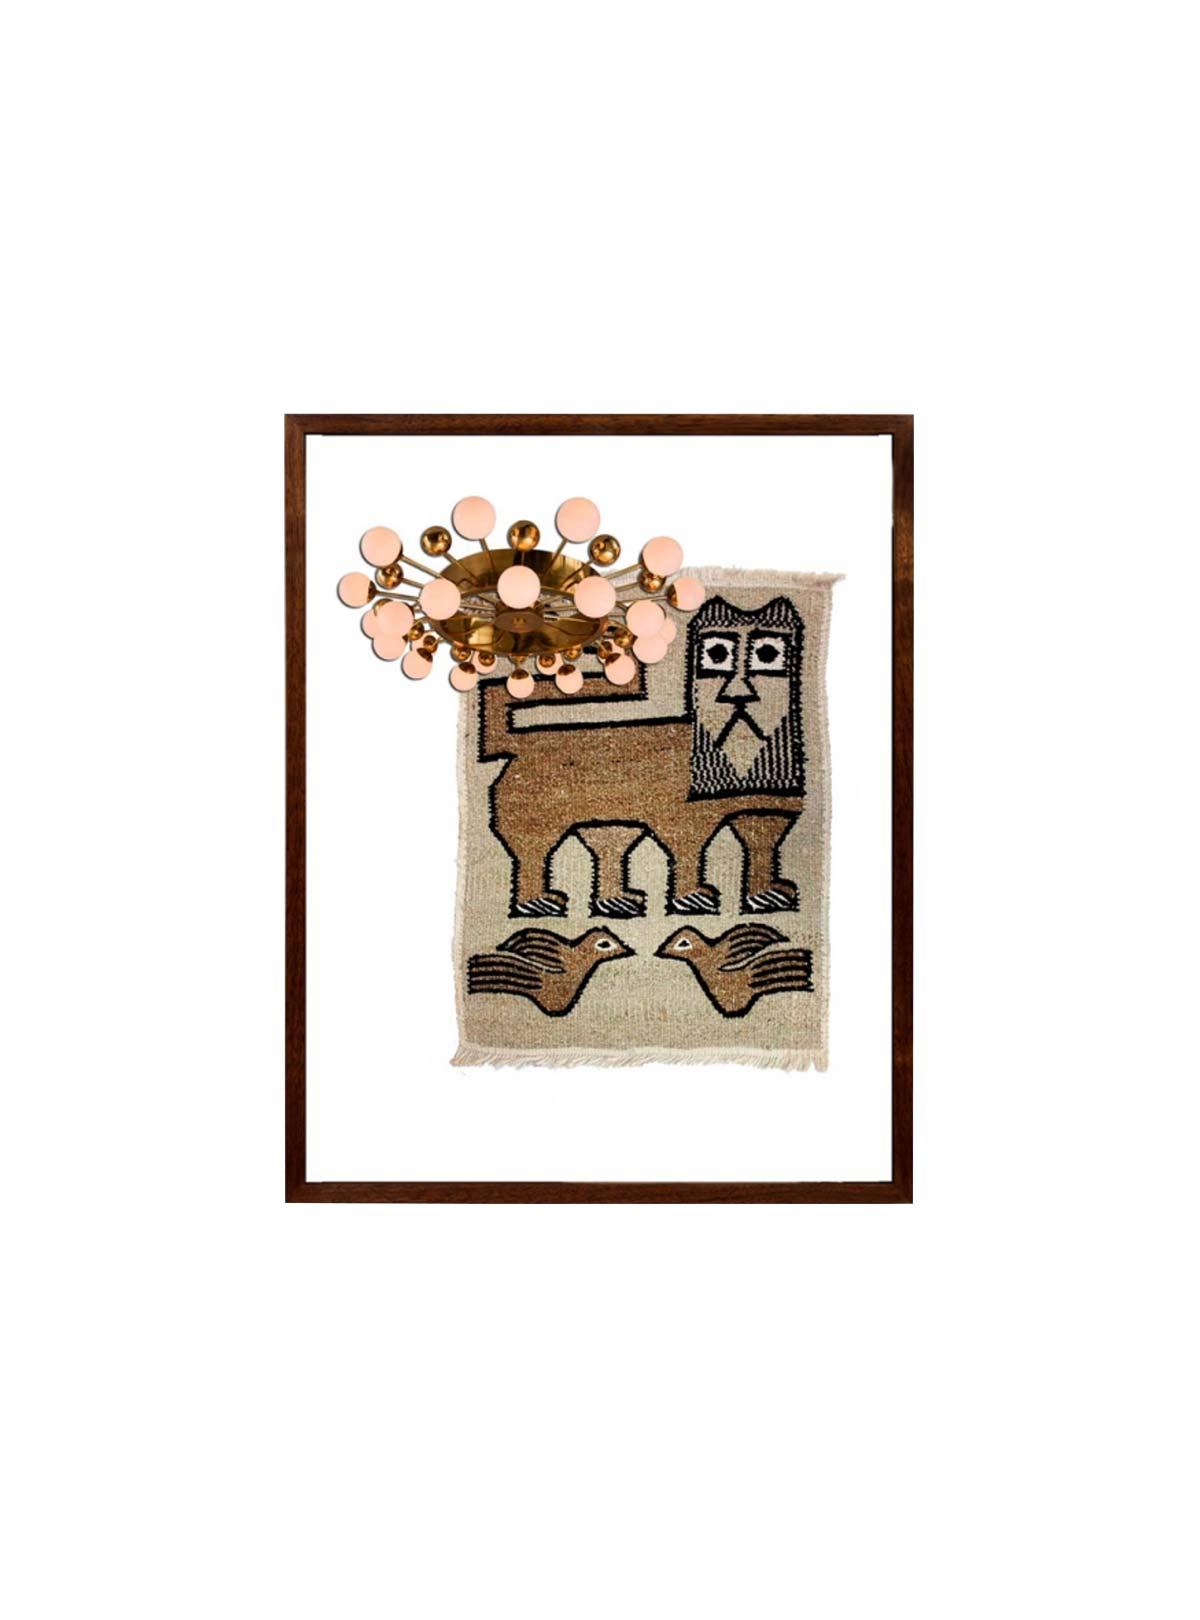 Aos9 Fine Art Bask 30 ✕ 40 cm